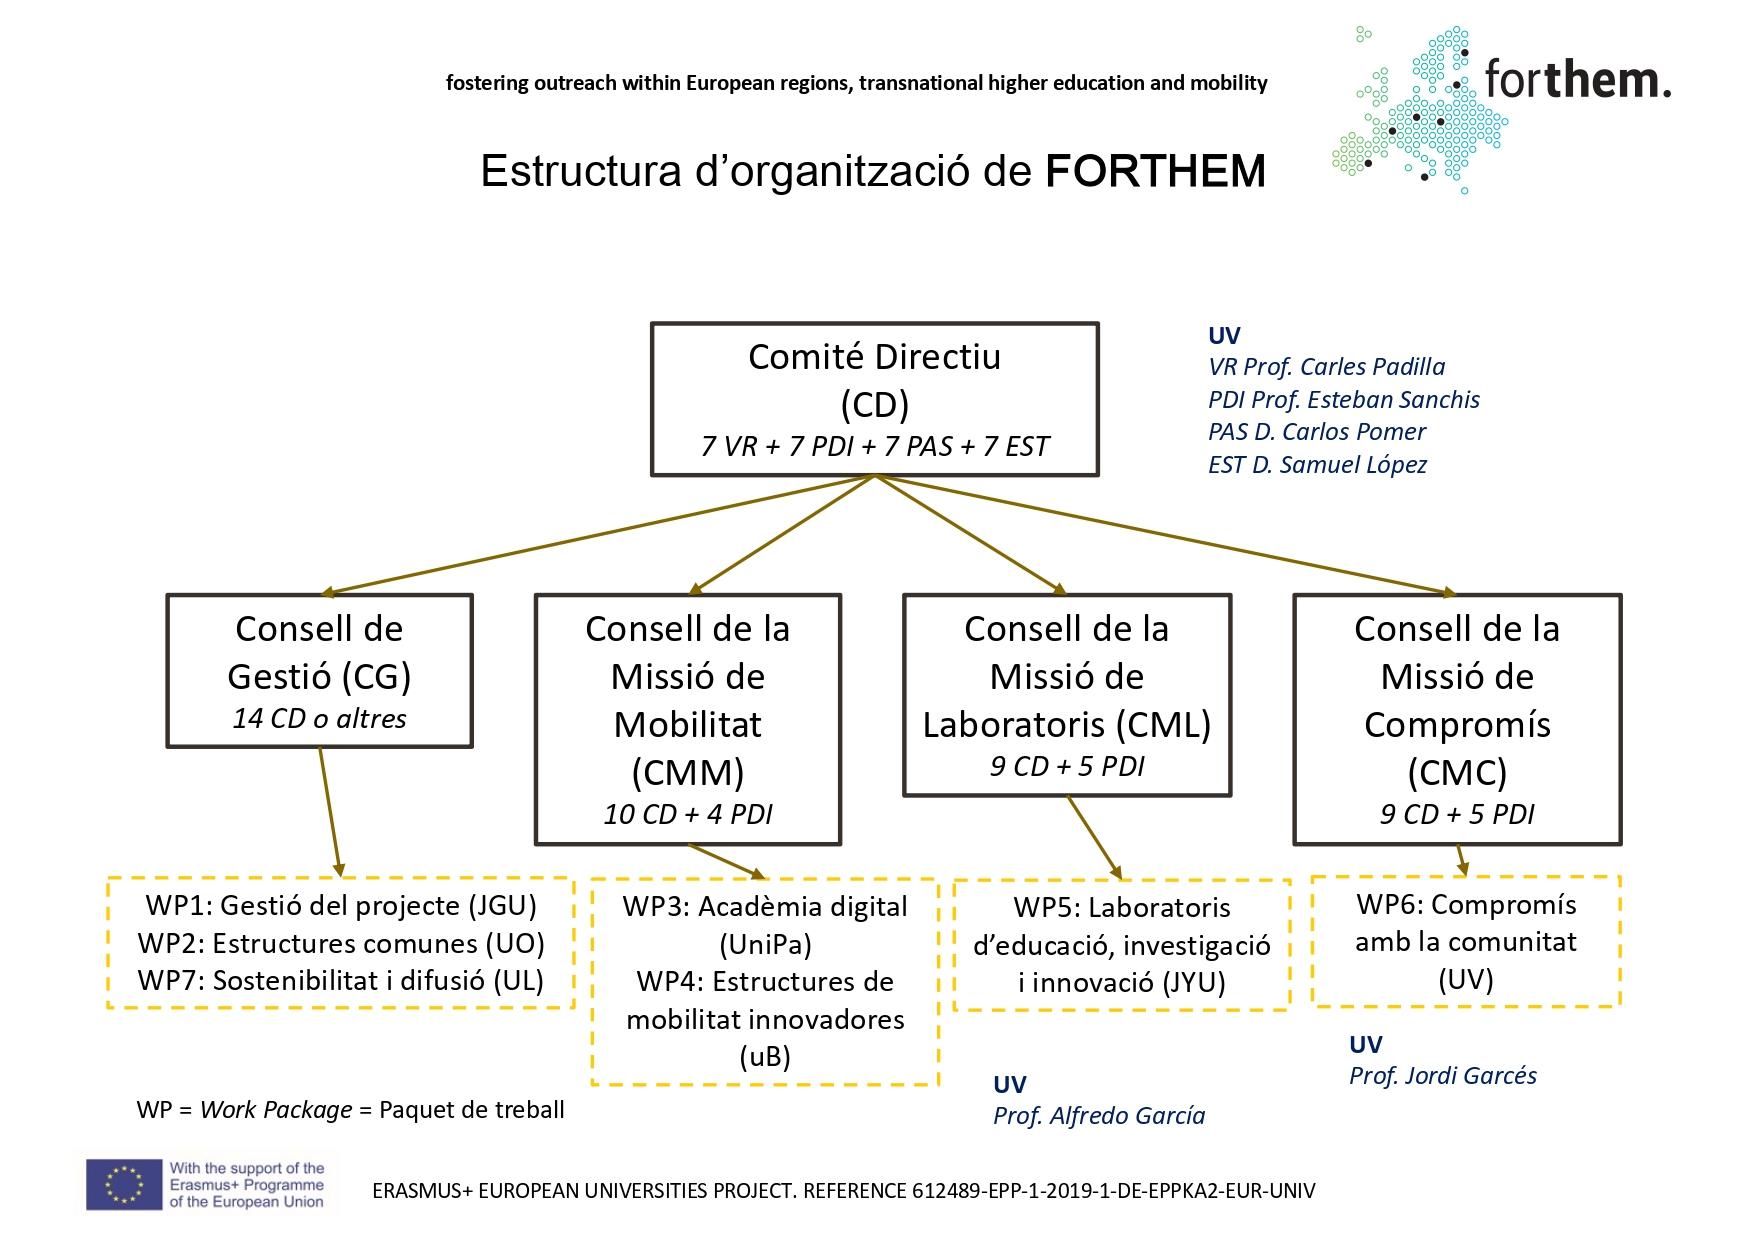 Forthem Estructura